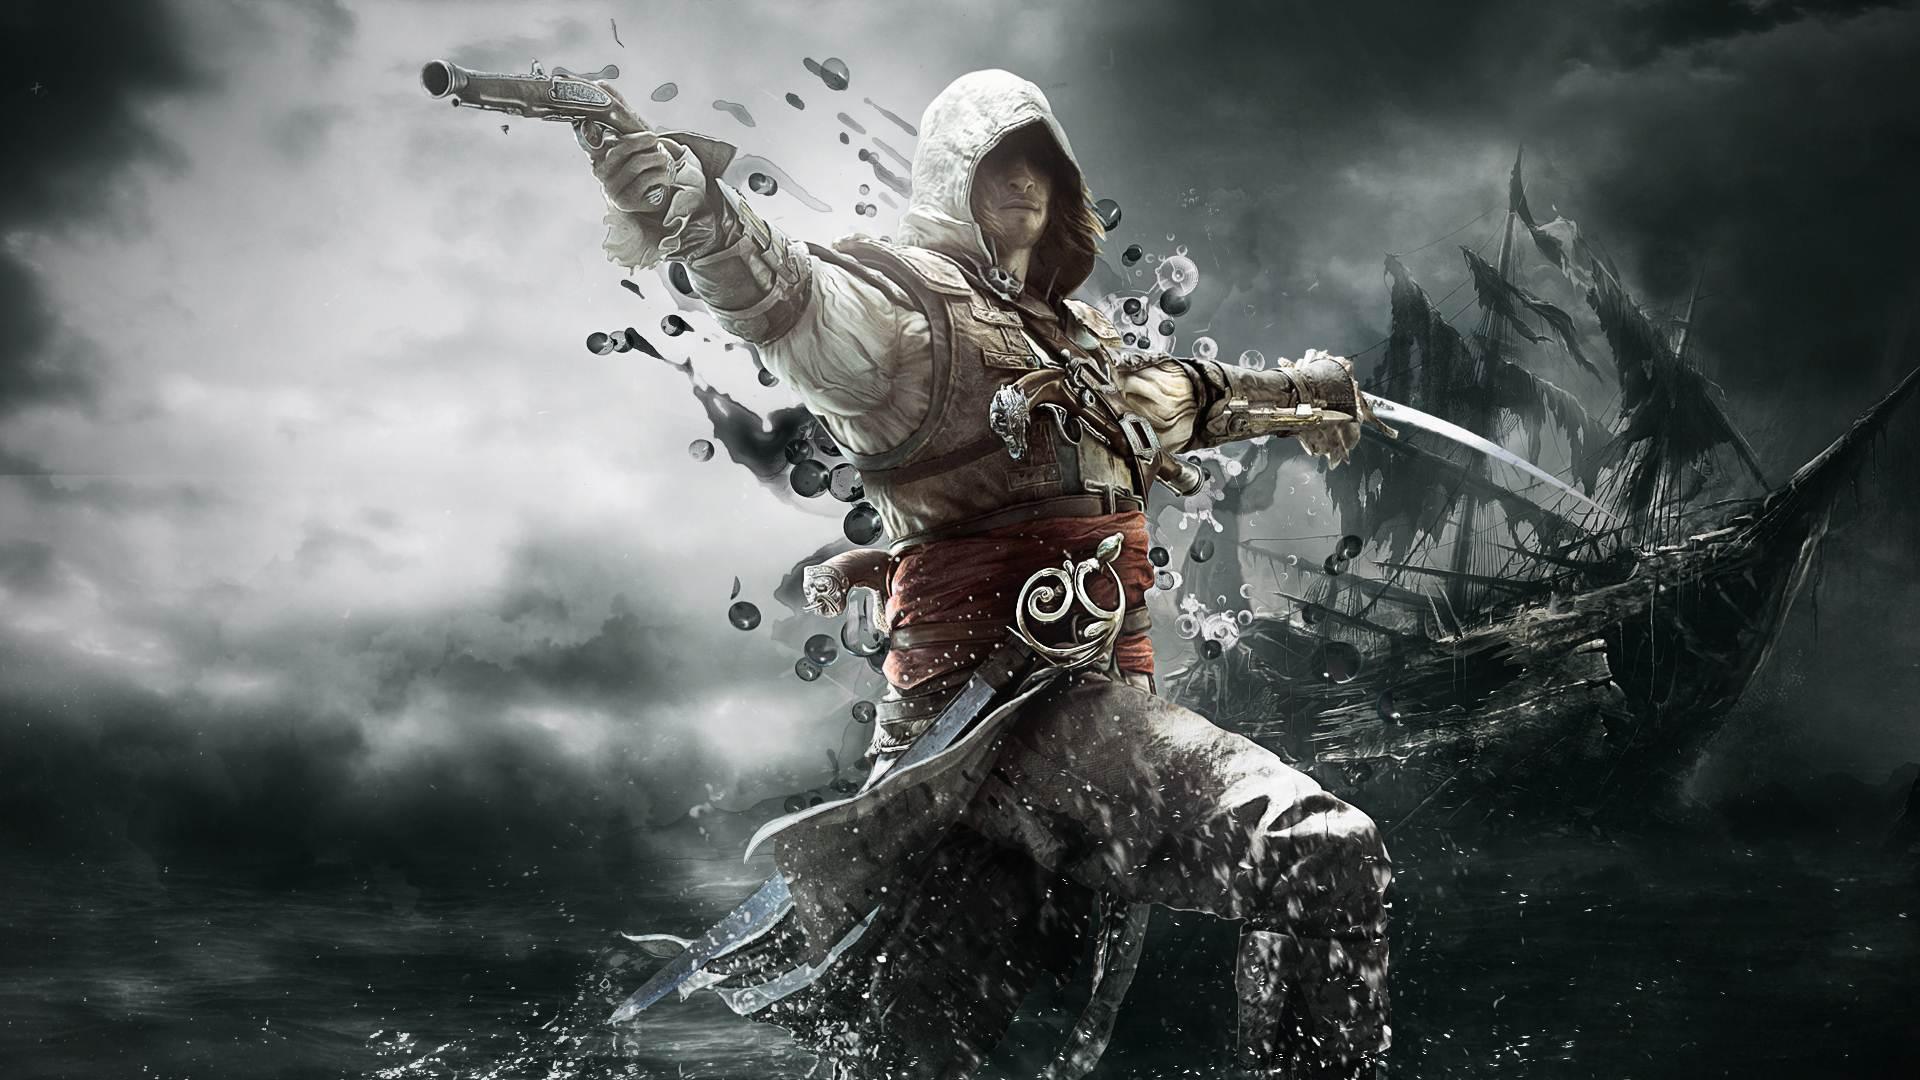 Assassin S Creed Iv Black Flag Jackdaw Edition Revealed Spawnfirst